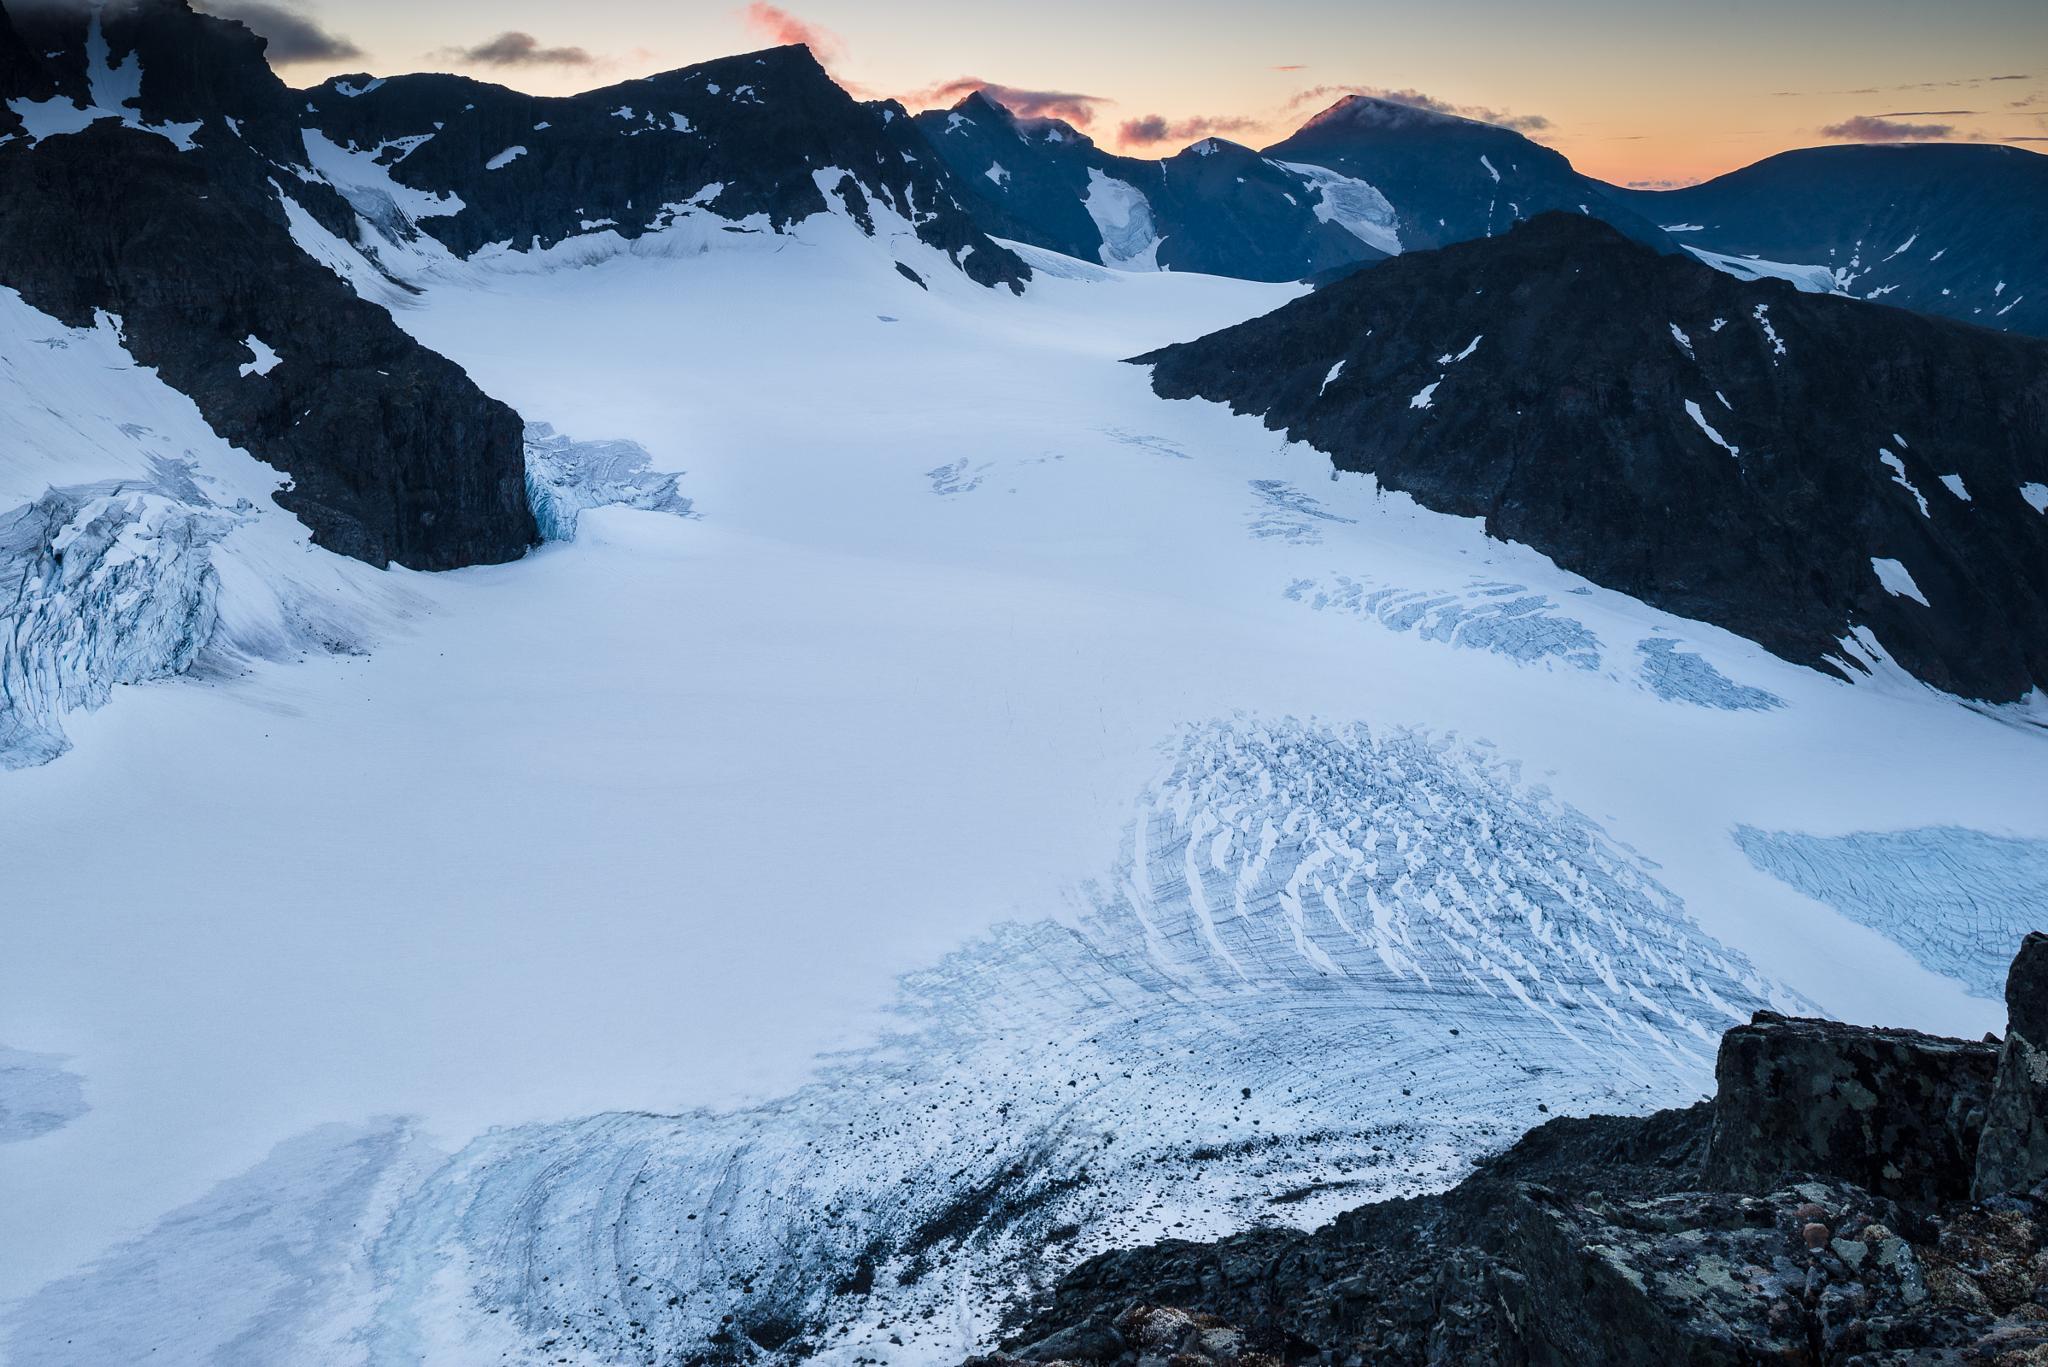 Storglaciären/the great glacier by Johan Schmitz Photography